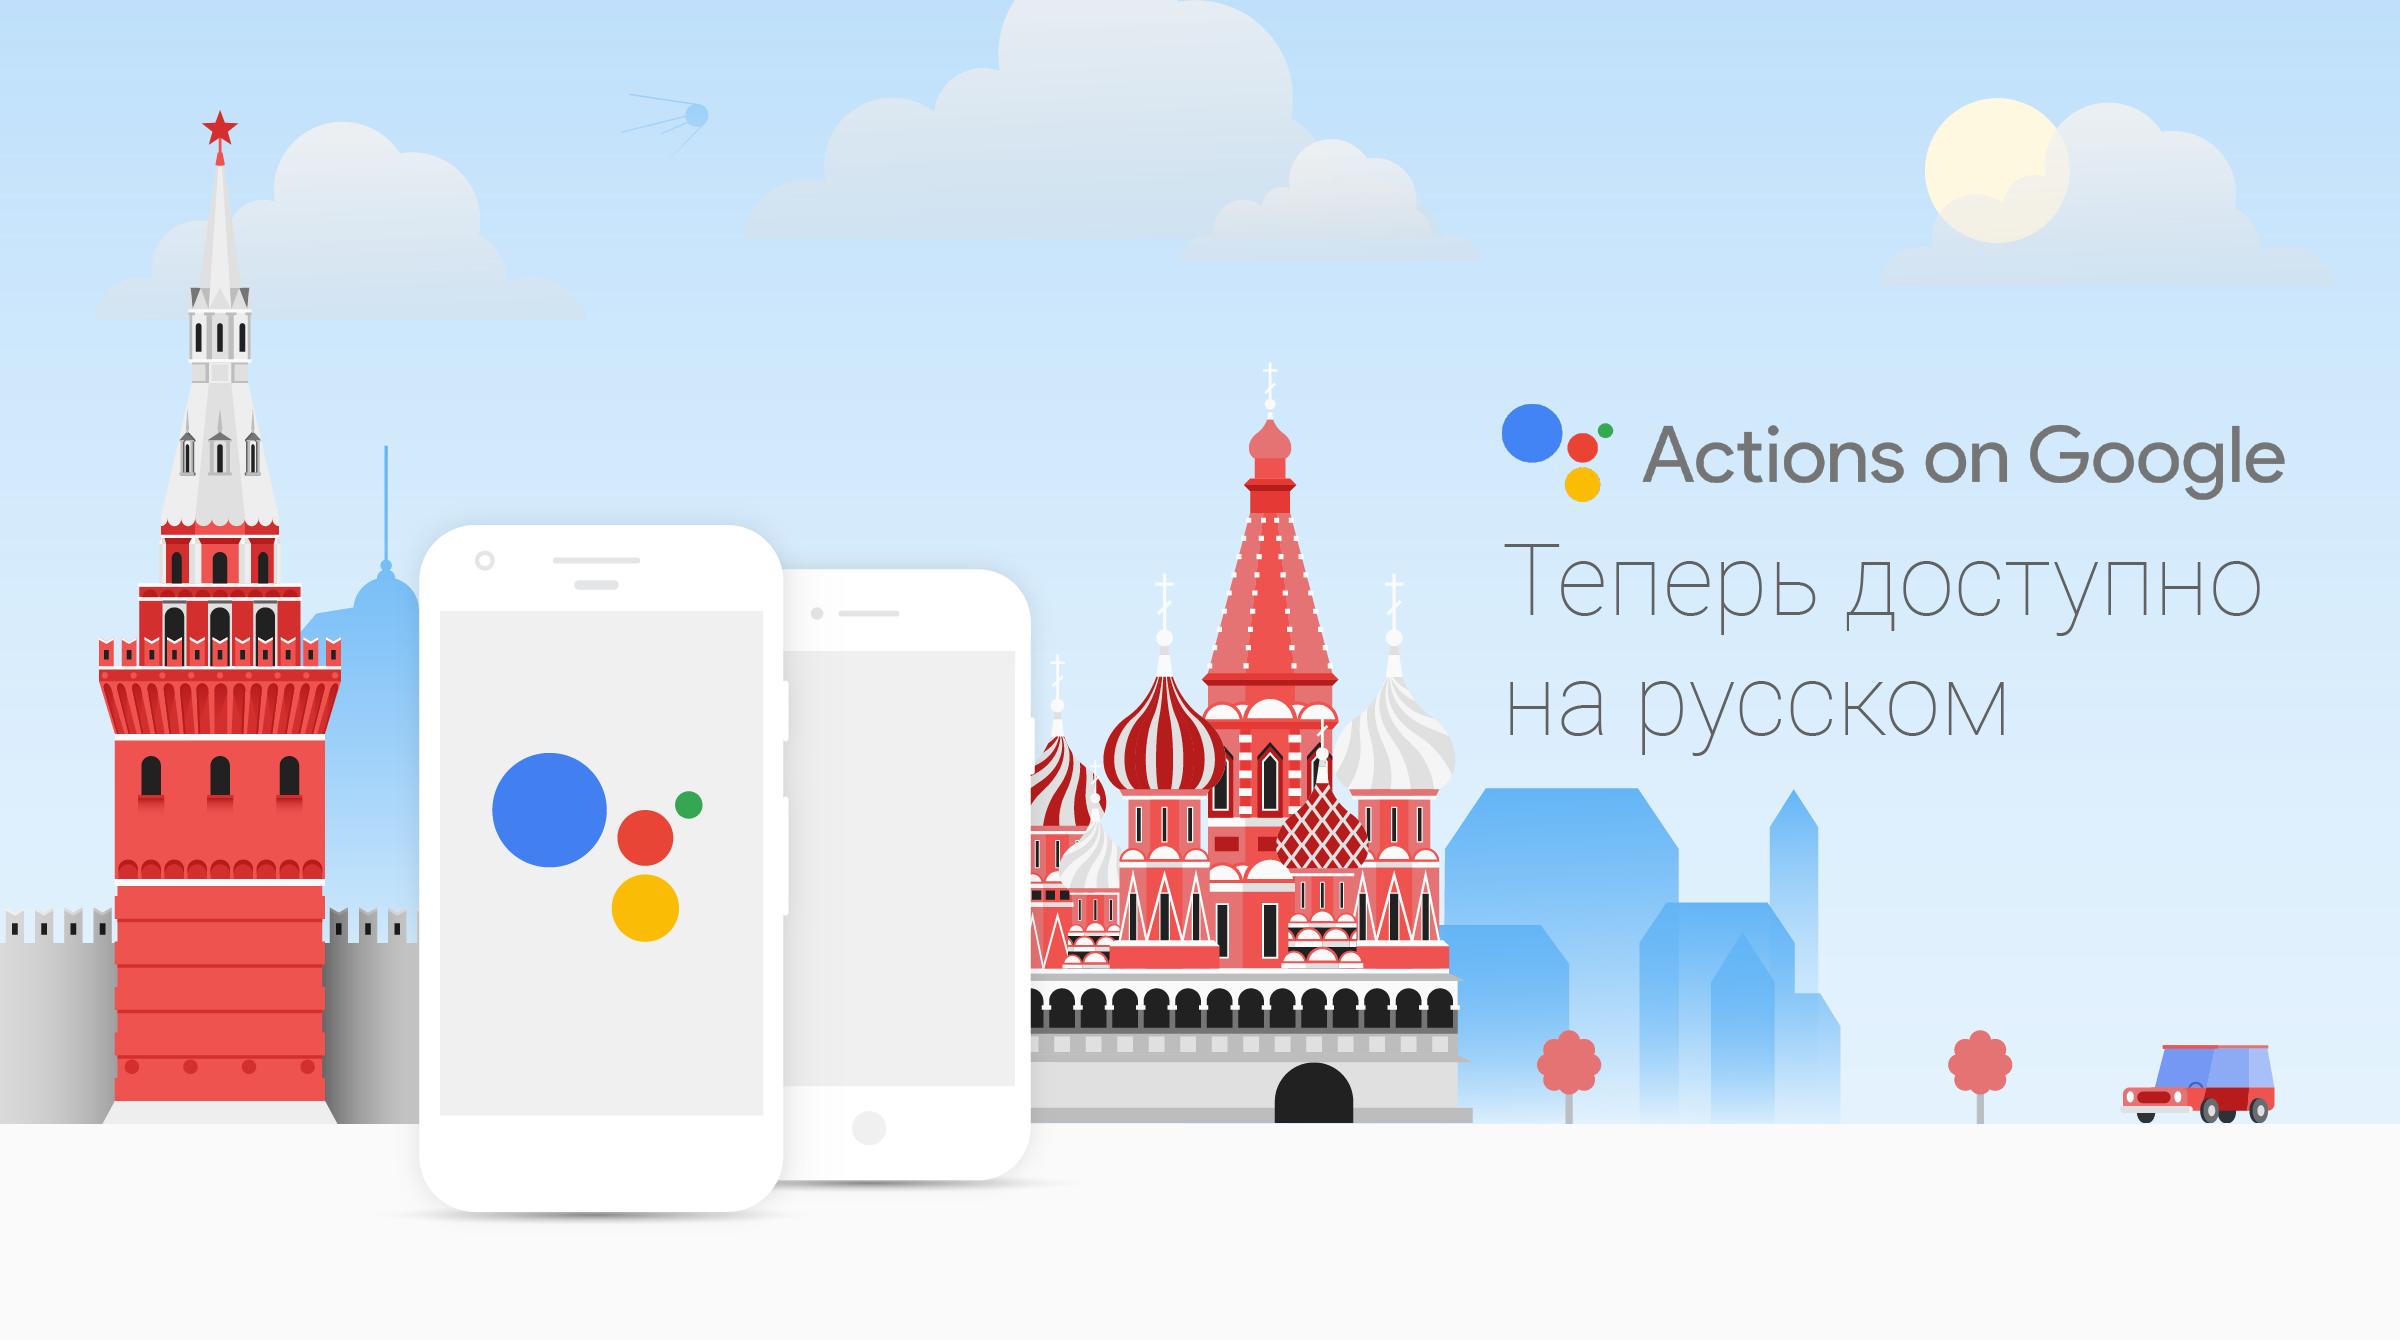 Google Ассистент скоро заговорит по-русски